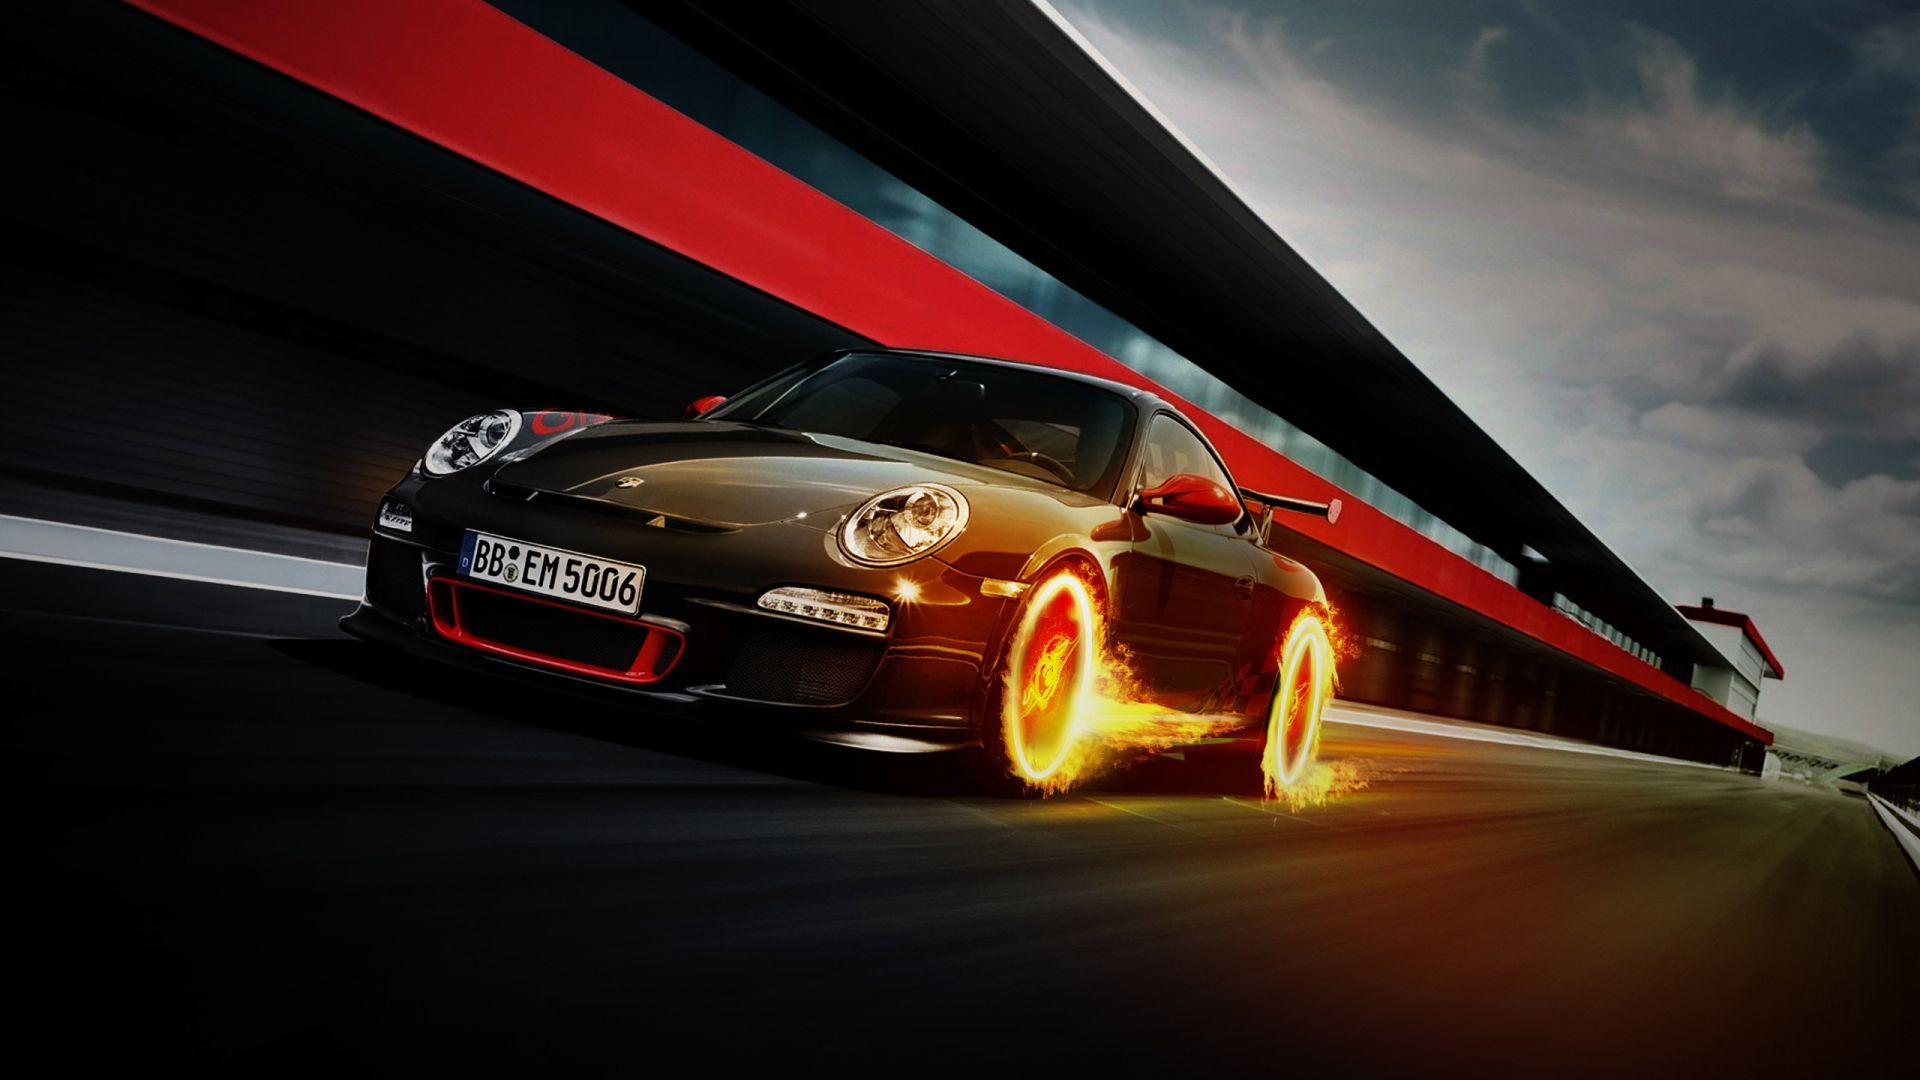 Porsche 911 GT3 RS, Black, Wheel On Fire